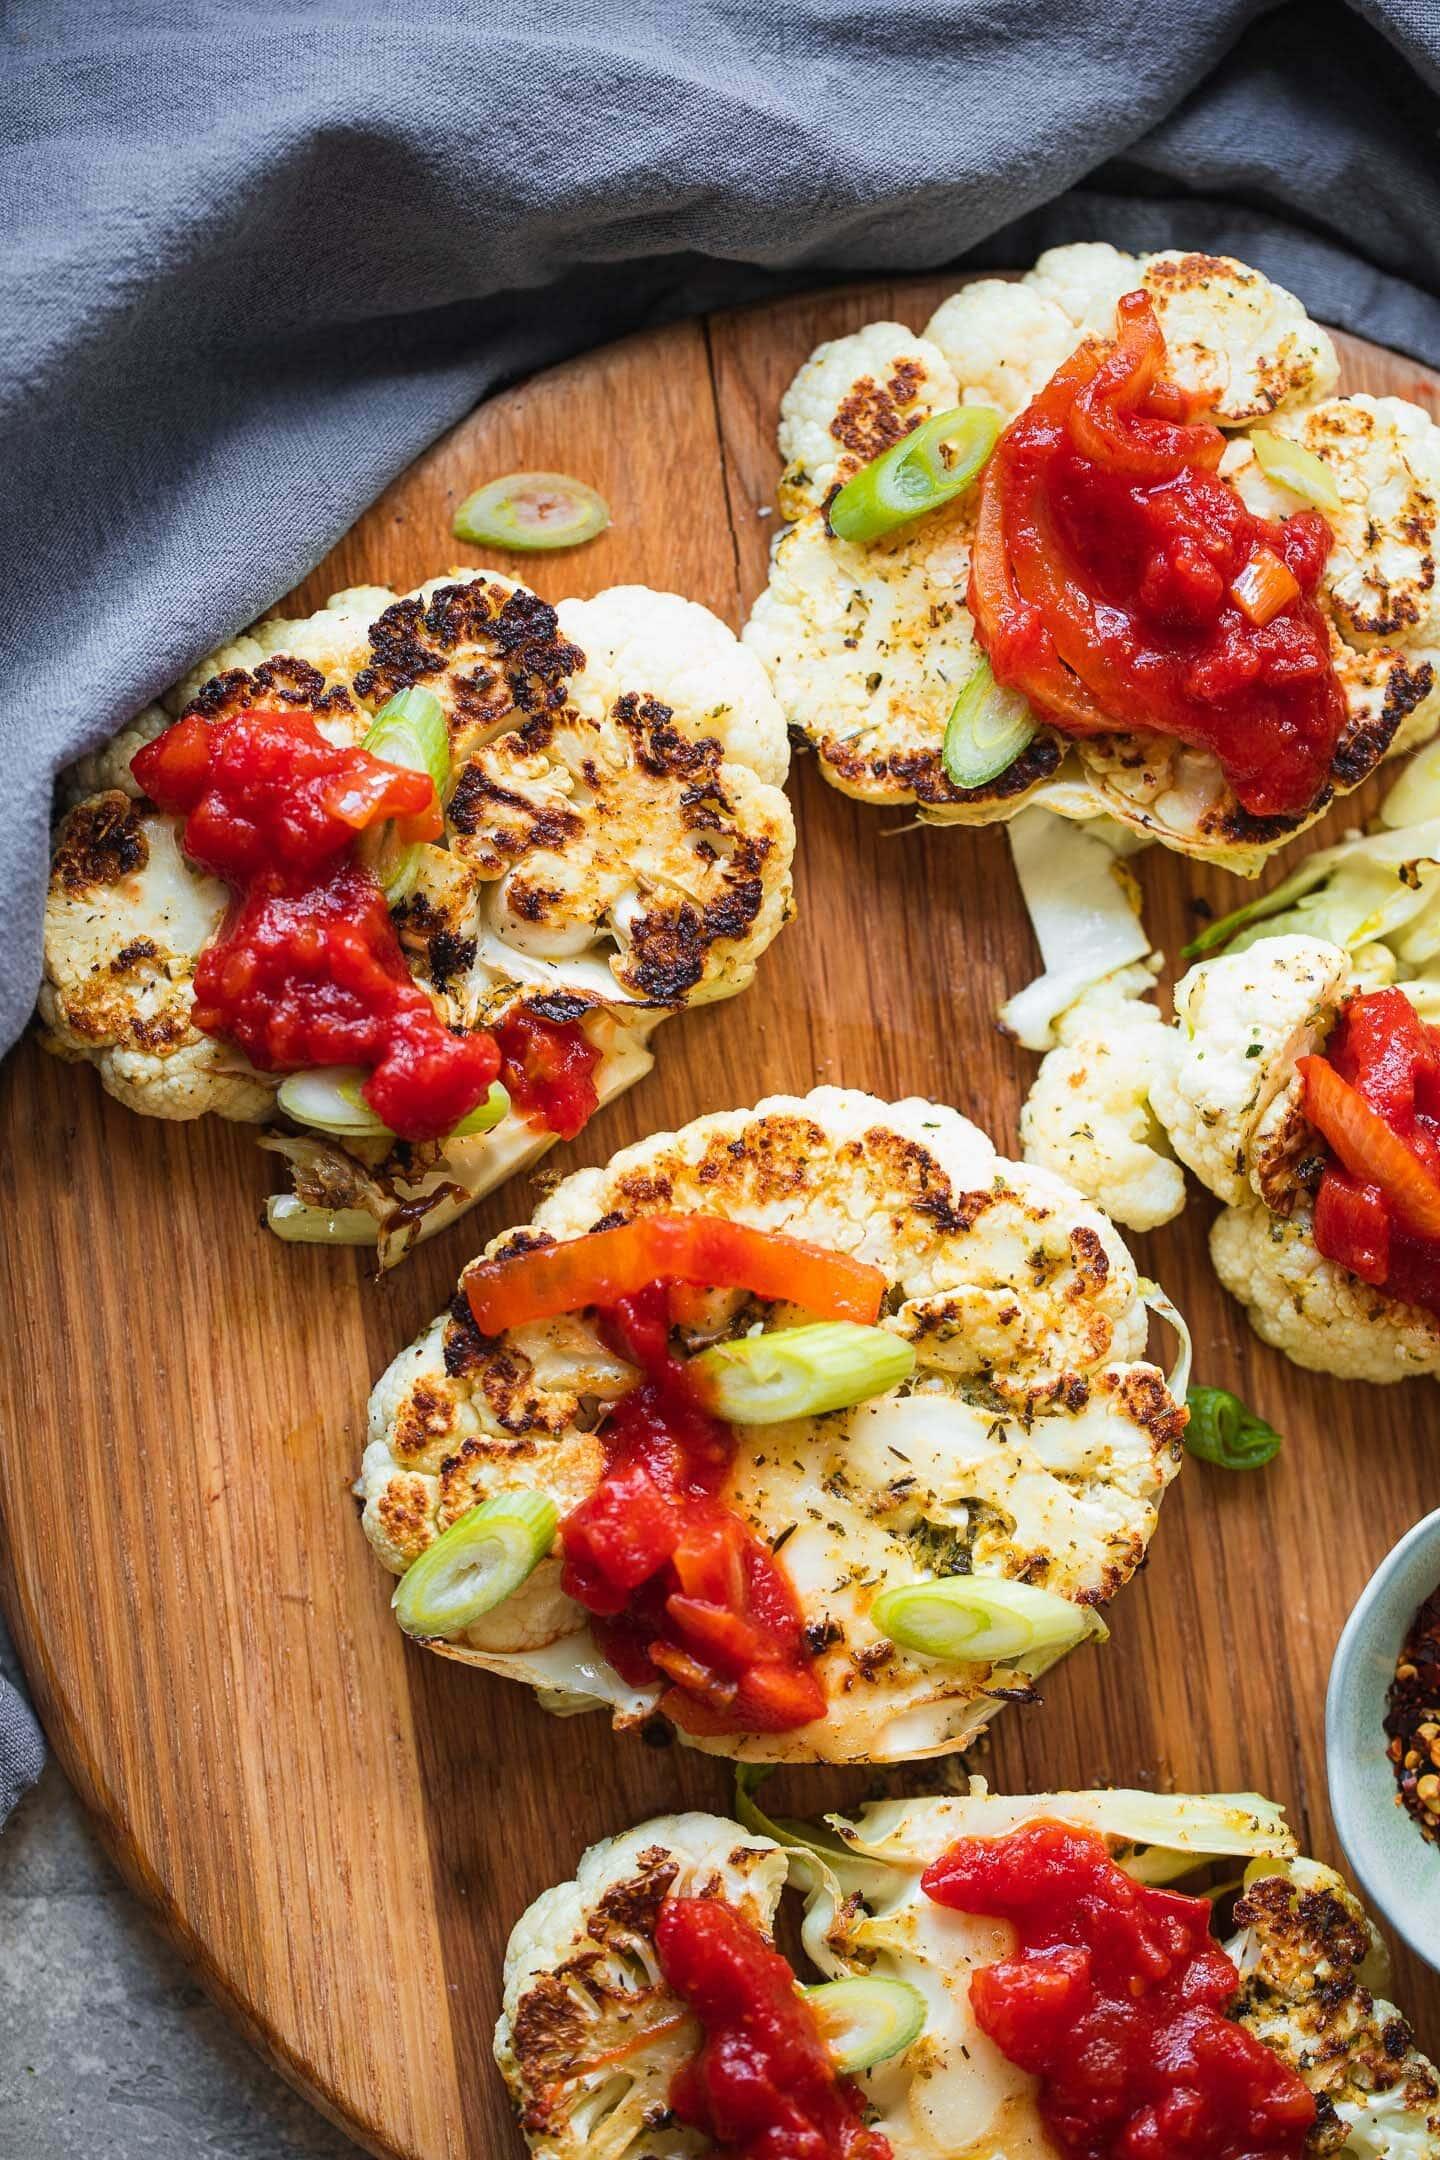 Vegan Cauliflower Steak With Tomato Sauce-12